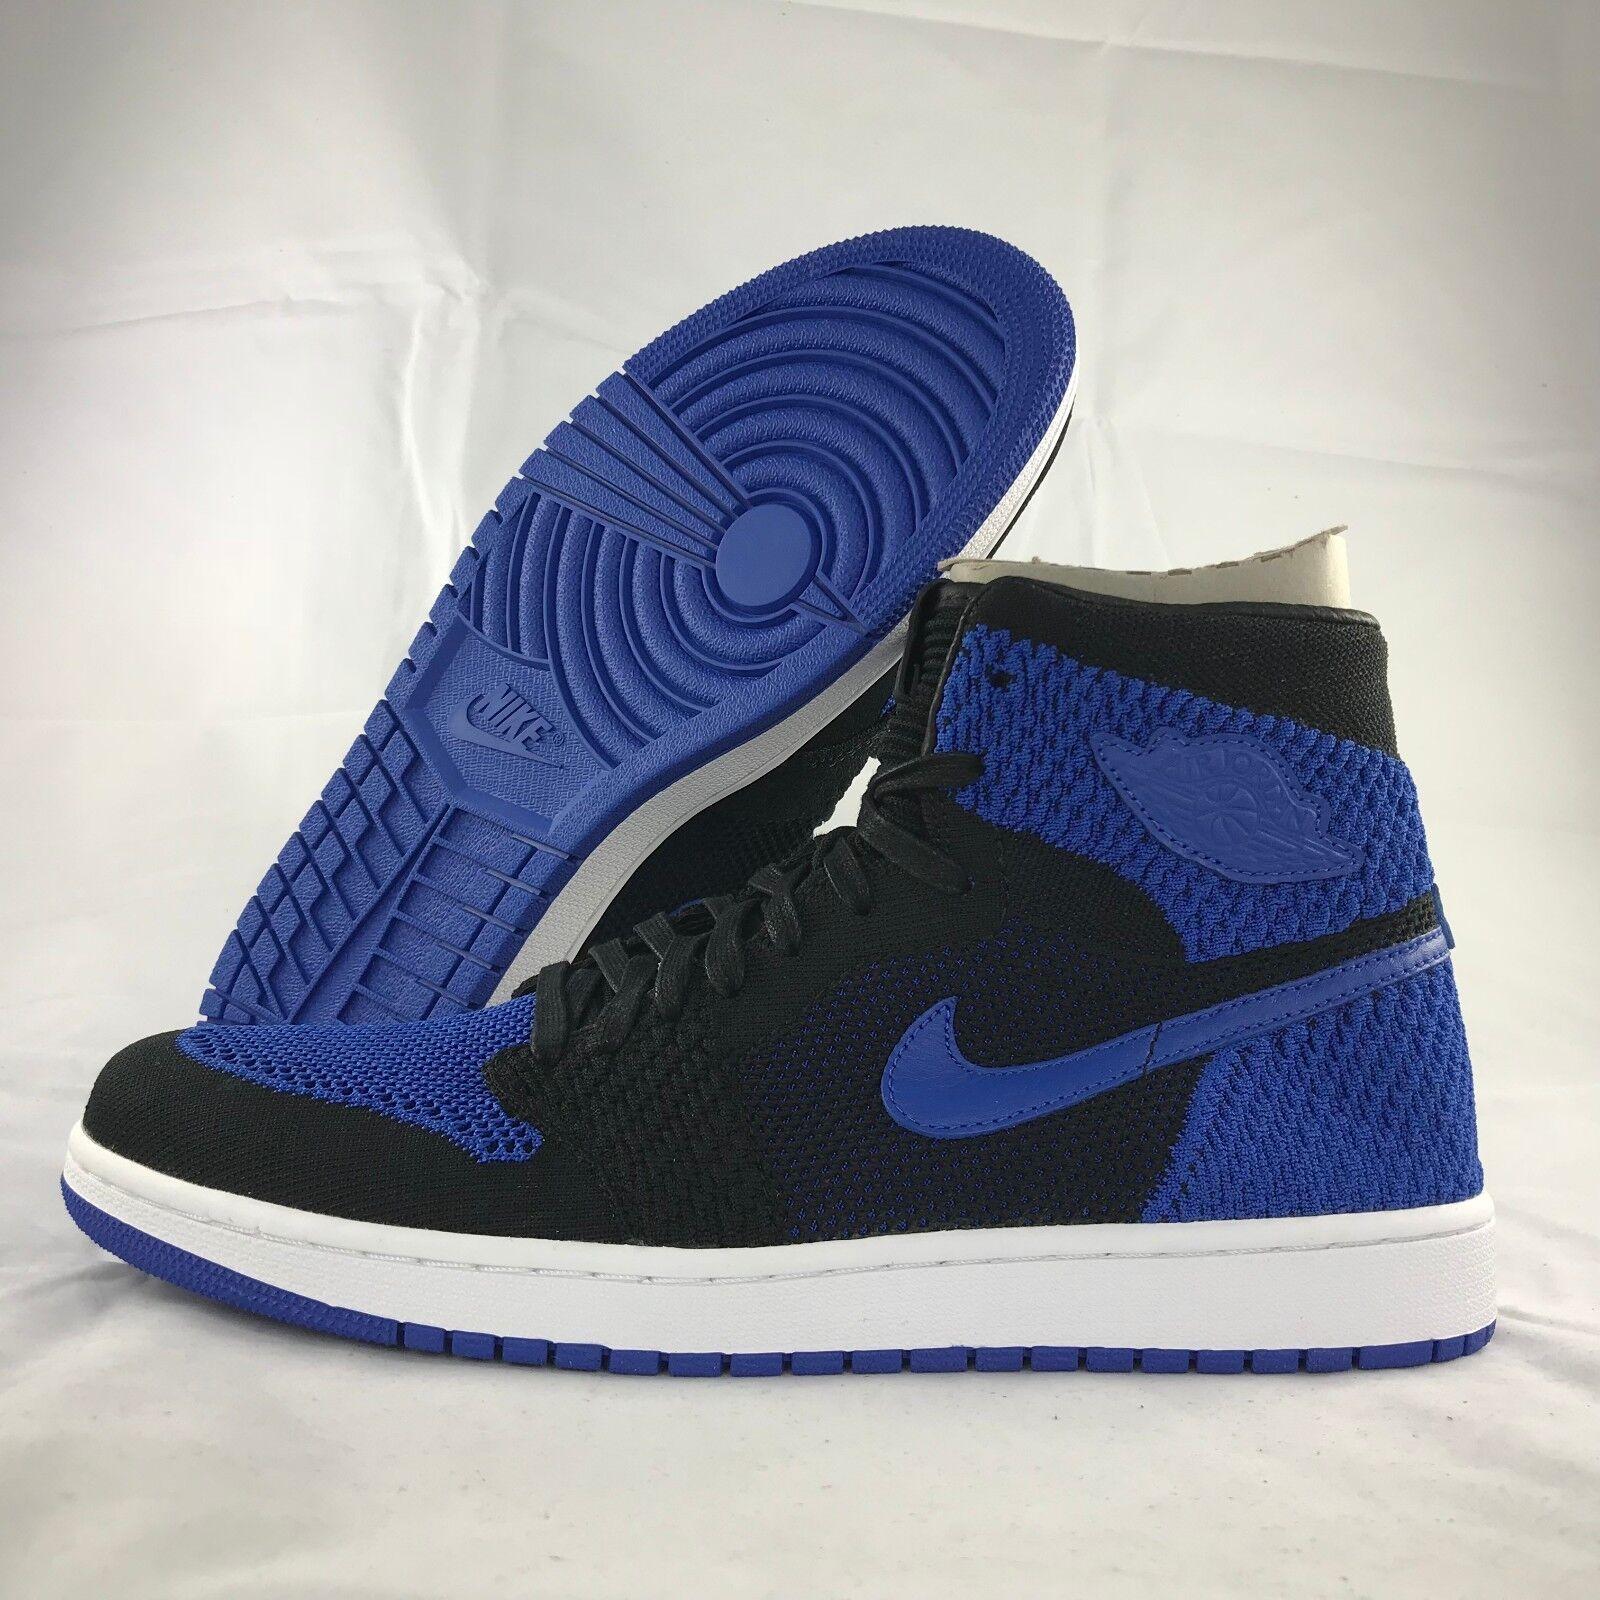 Nike Air Jordan 1 Retro HI Flyknit Royal bluee Black 919704-006 Men's 10.5-12